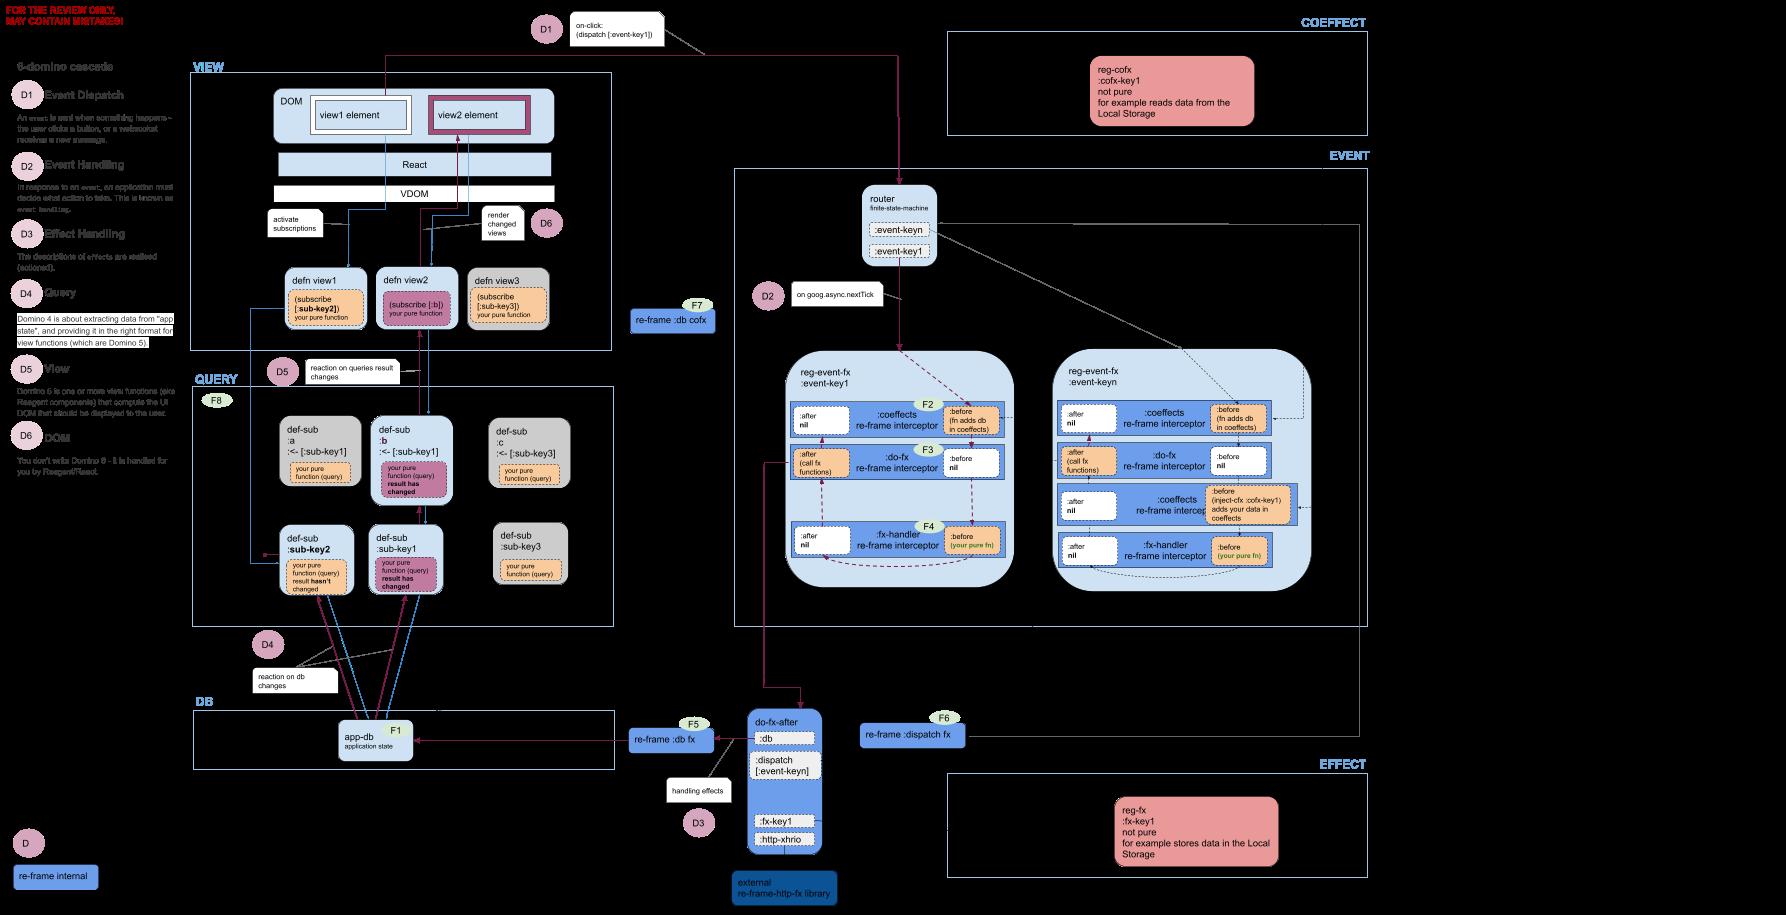 GitHub - flexsurfer/re-frisk: Visualize re-frame pattern data or ...